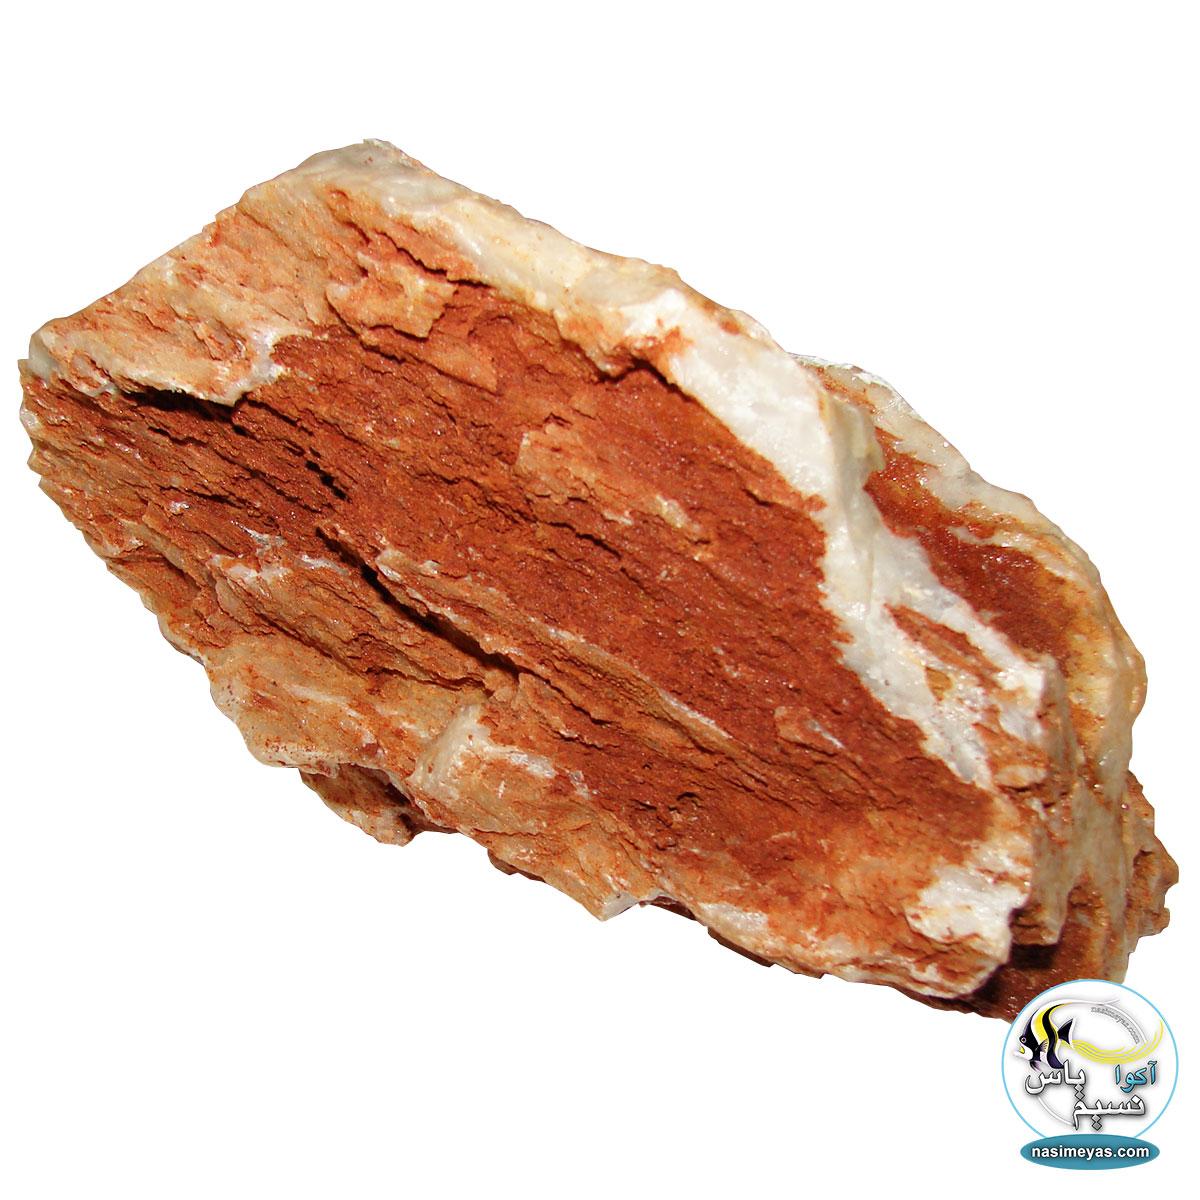 سنگ دراگون قرمز رنگ